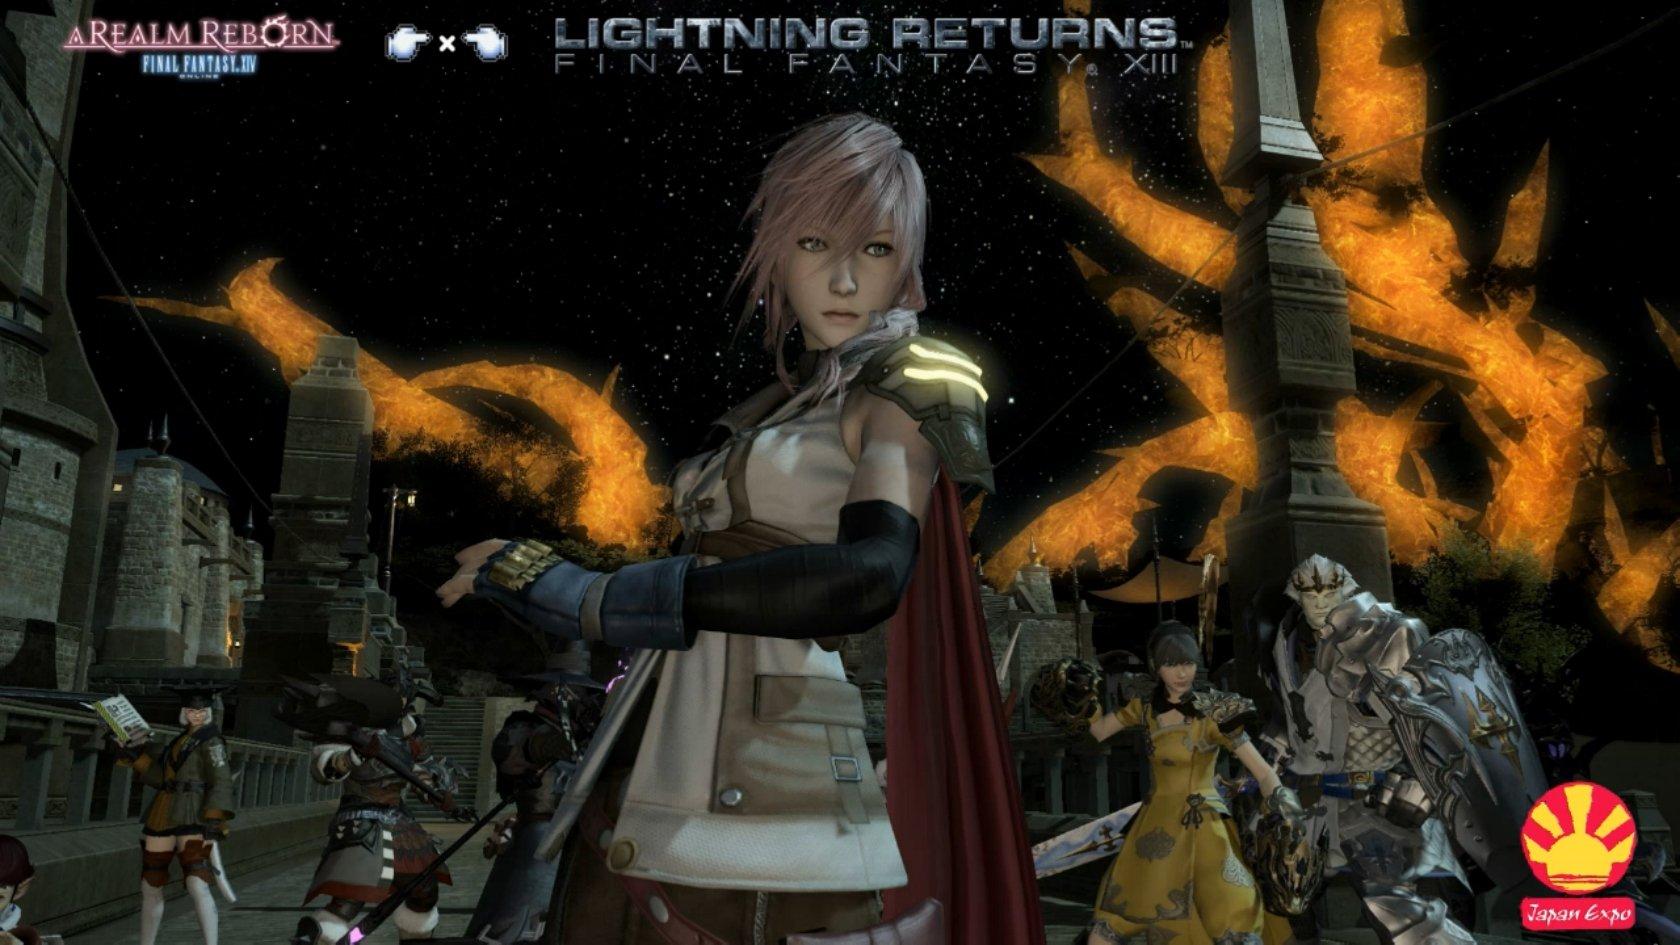 Final Fantasy XIV has Lightning costume, more - Gematsu